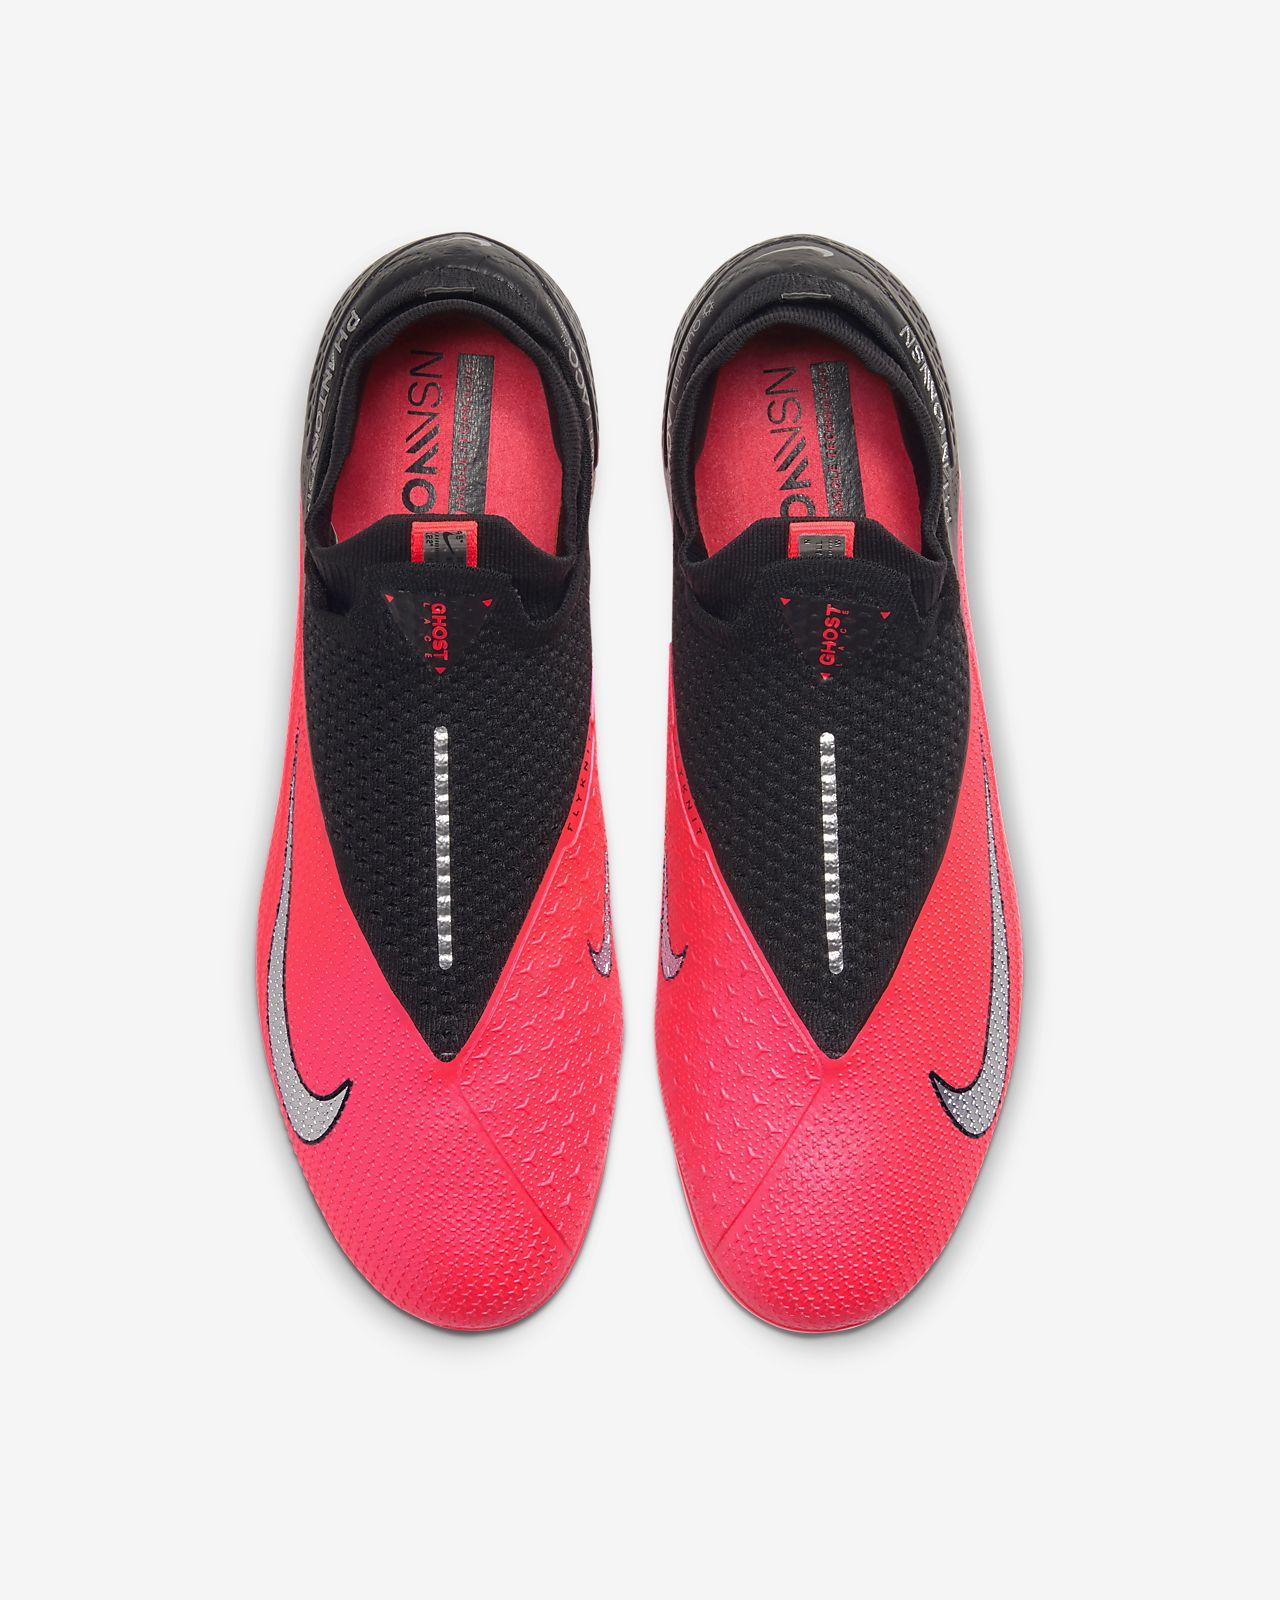 Rasen Phantom 2 FG Fußballschuh Vision für Dynamic Fit Nike